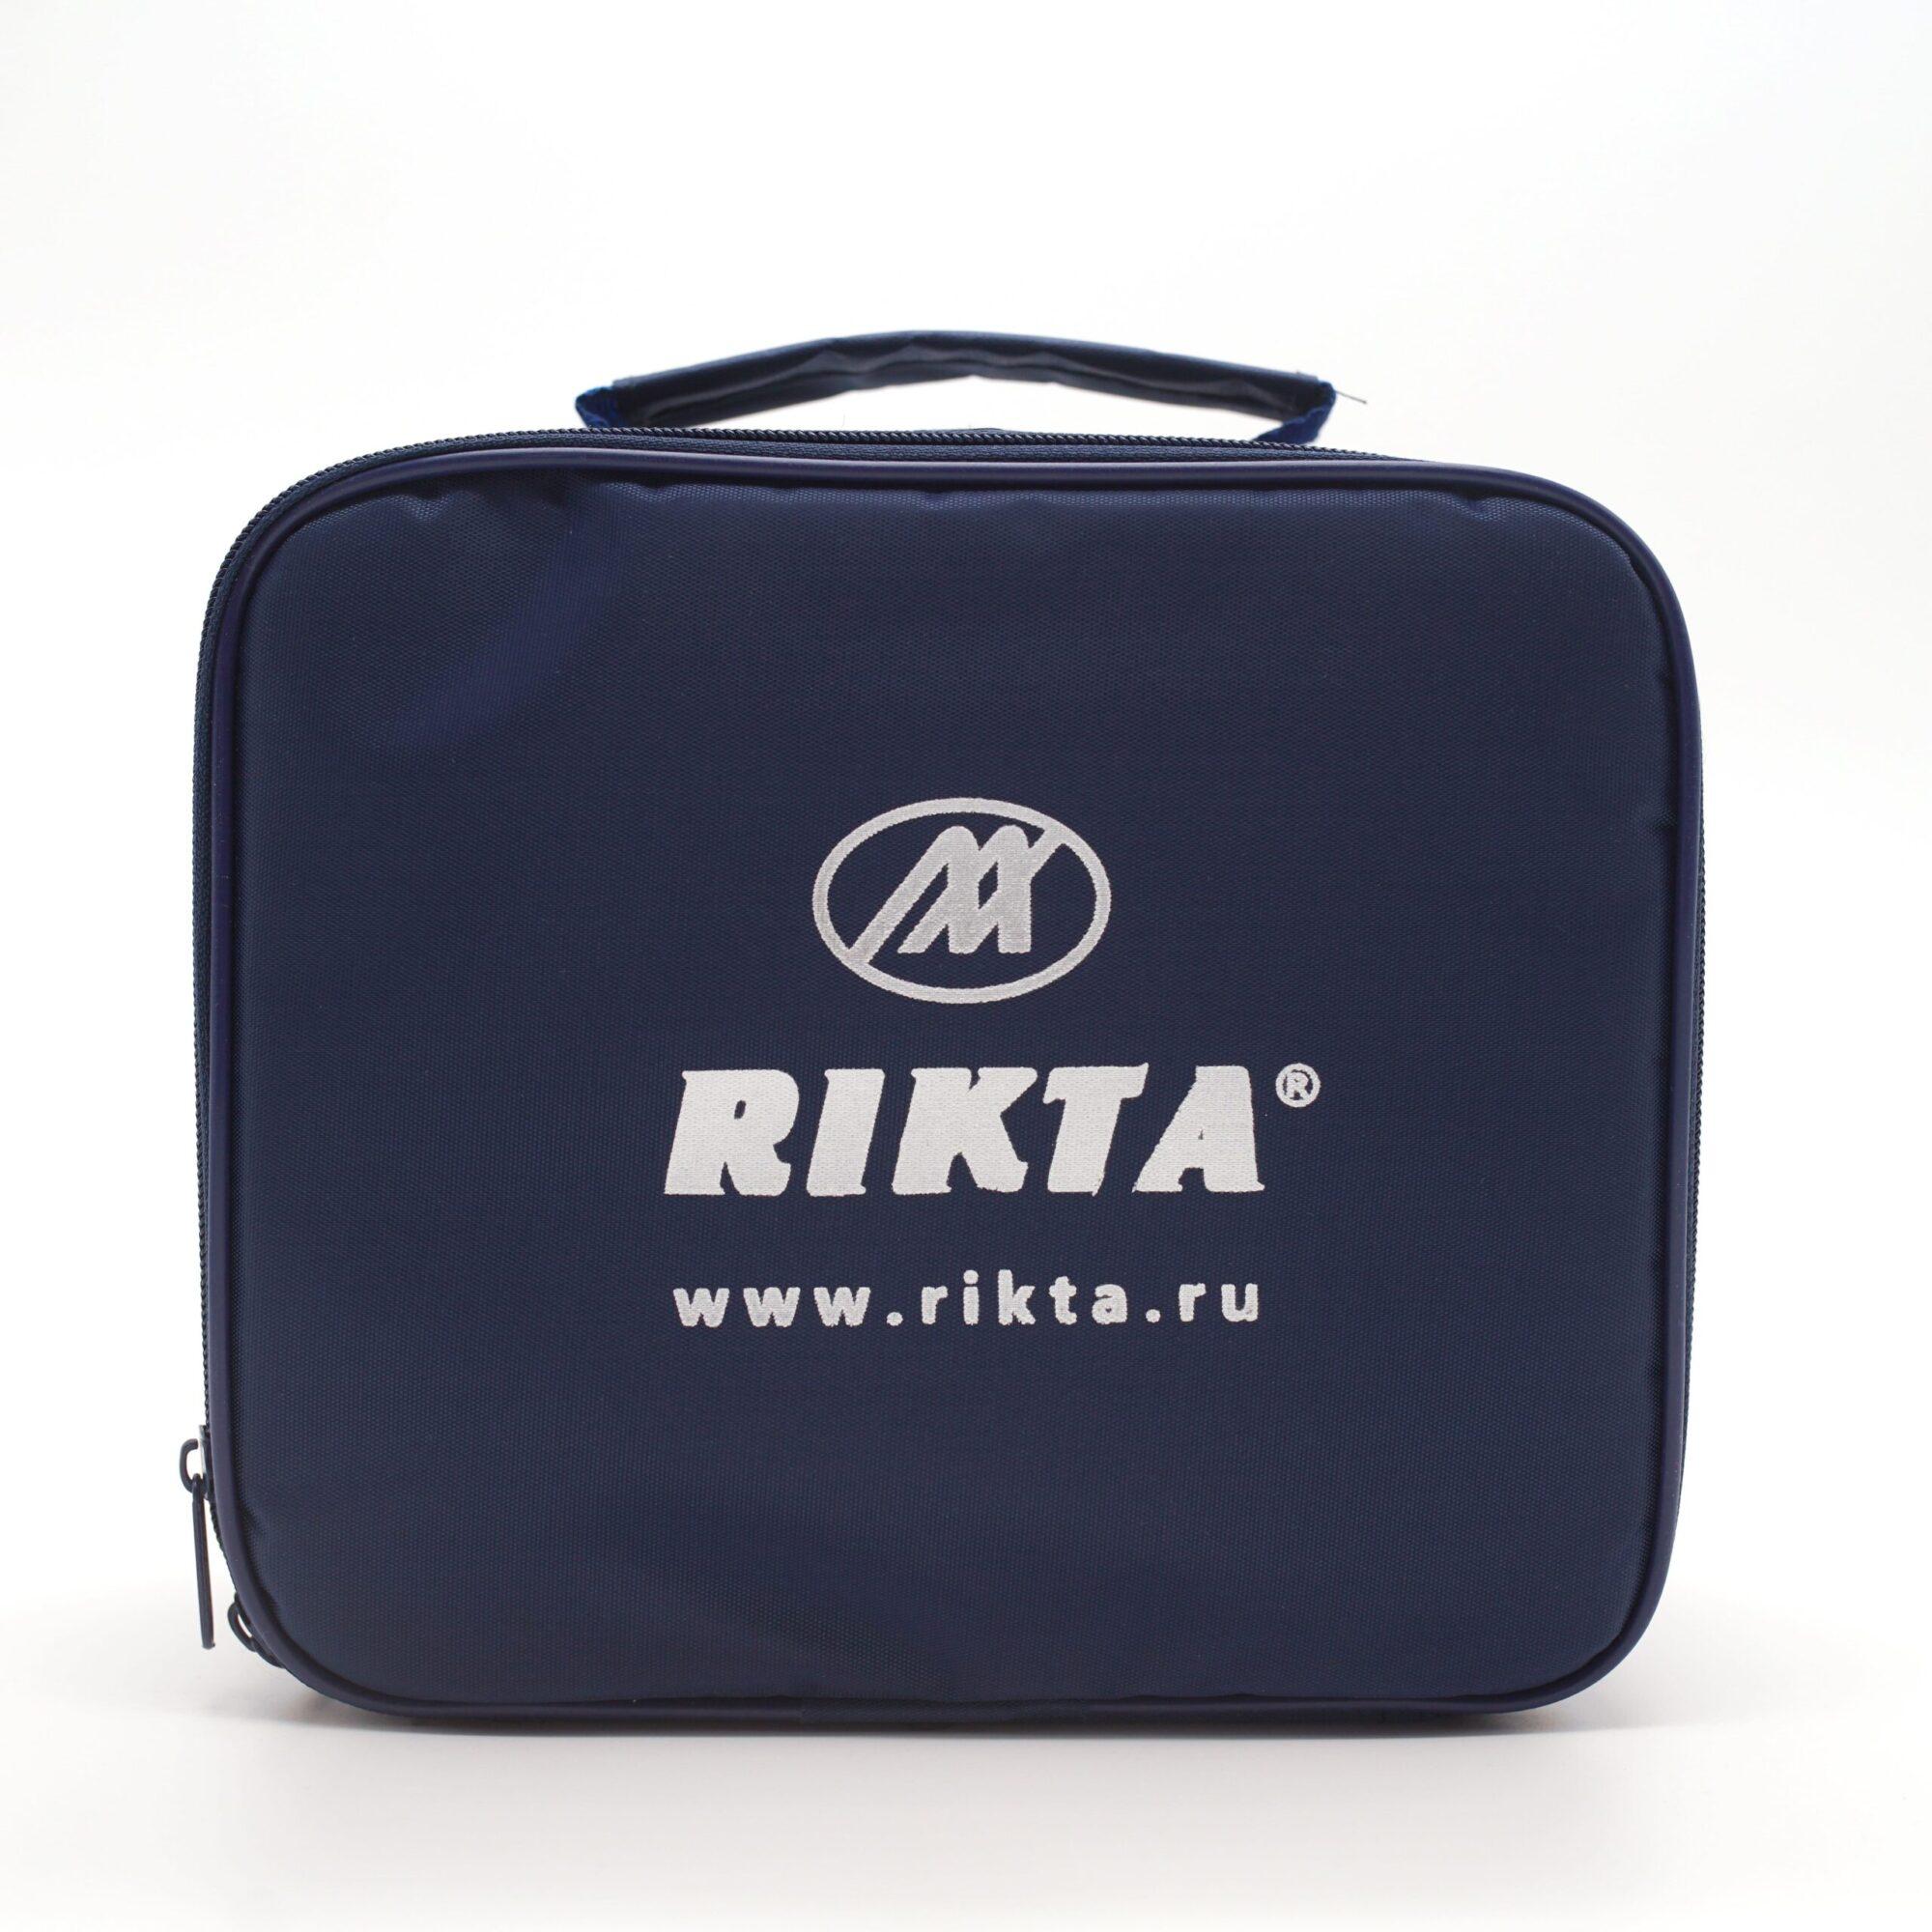 Рикта-Эсмил(1)А-7